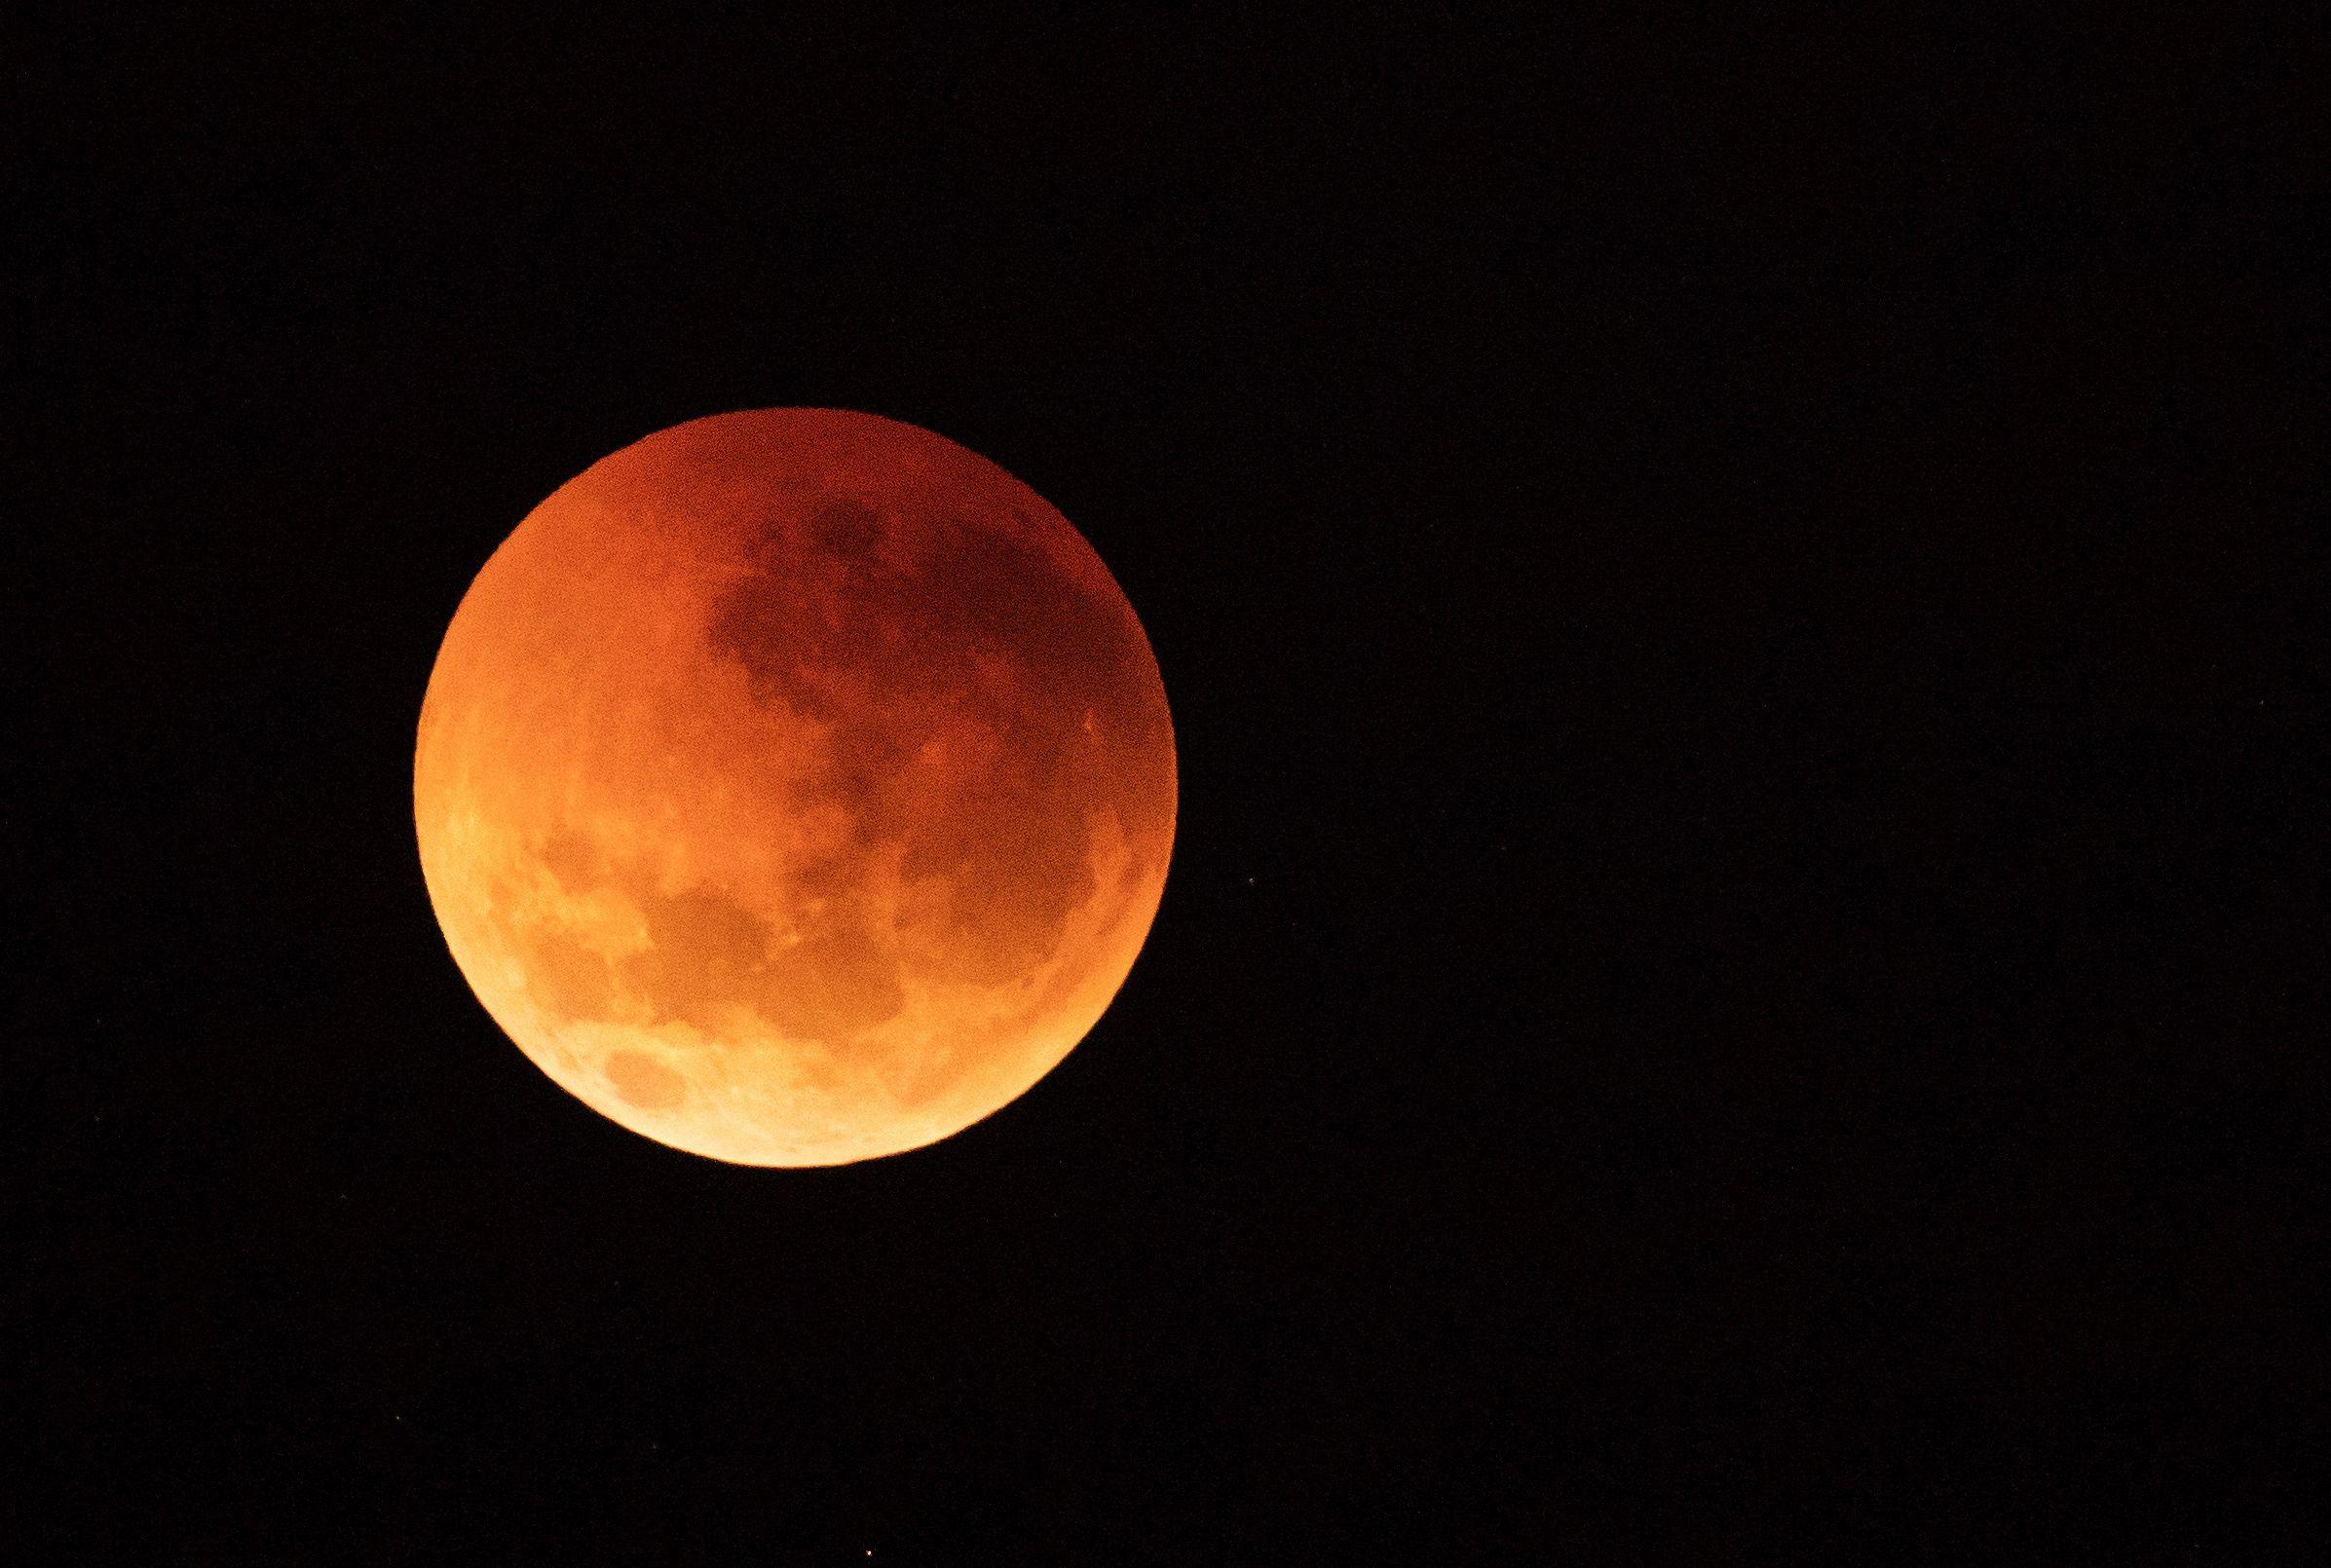 super moon january 2 2020 astrology